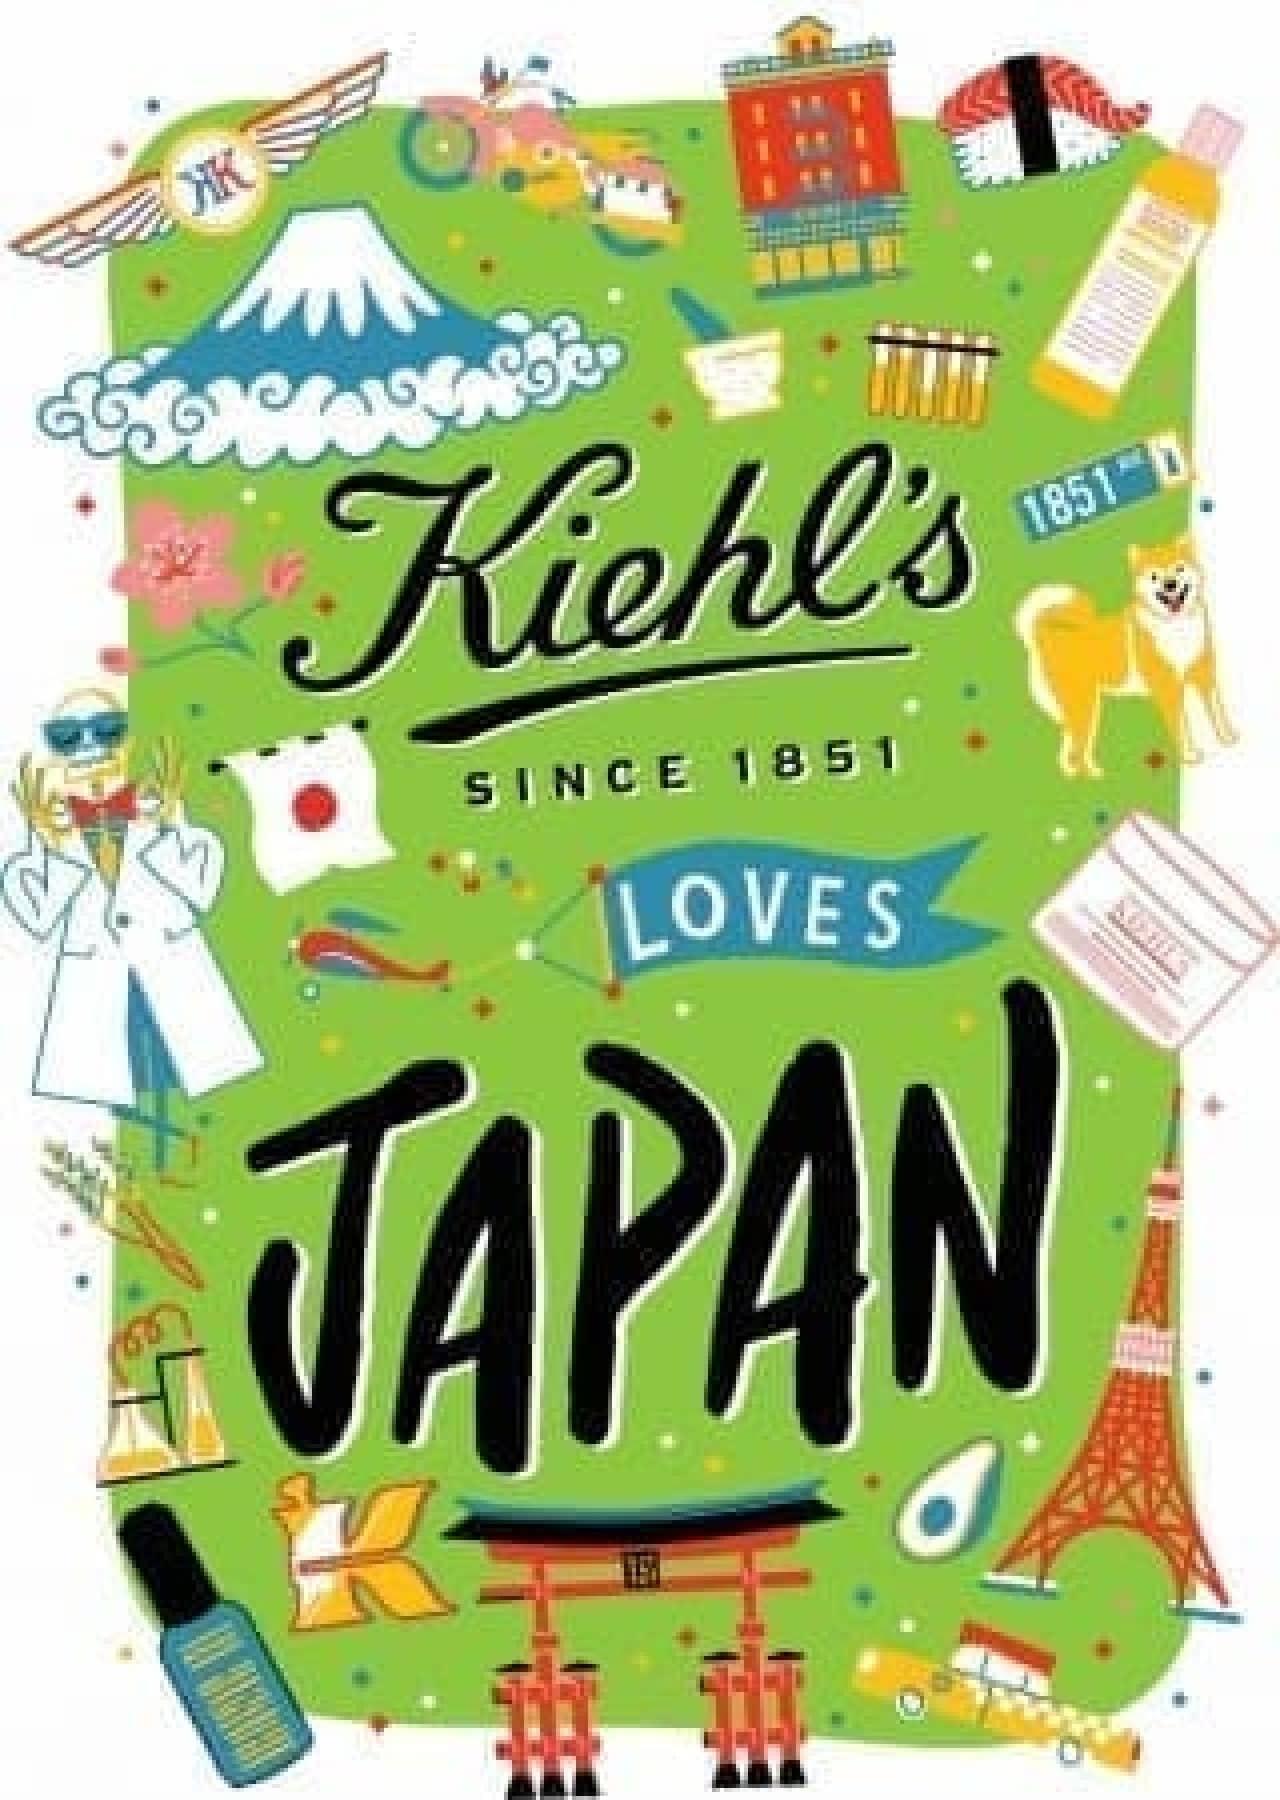 Kiehl's loves JAPAN(キールズ ラブズ ジャパン)限定エディション